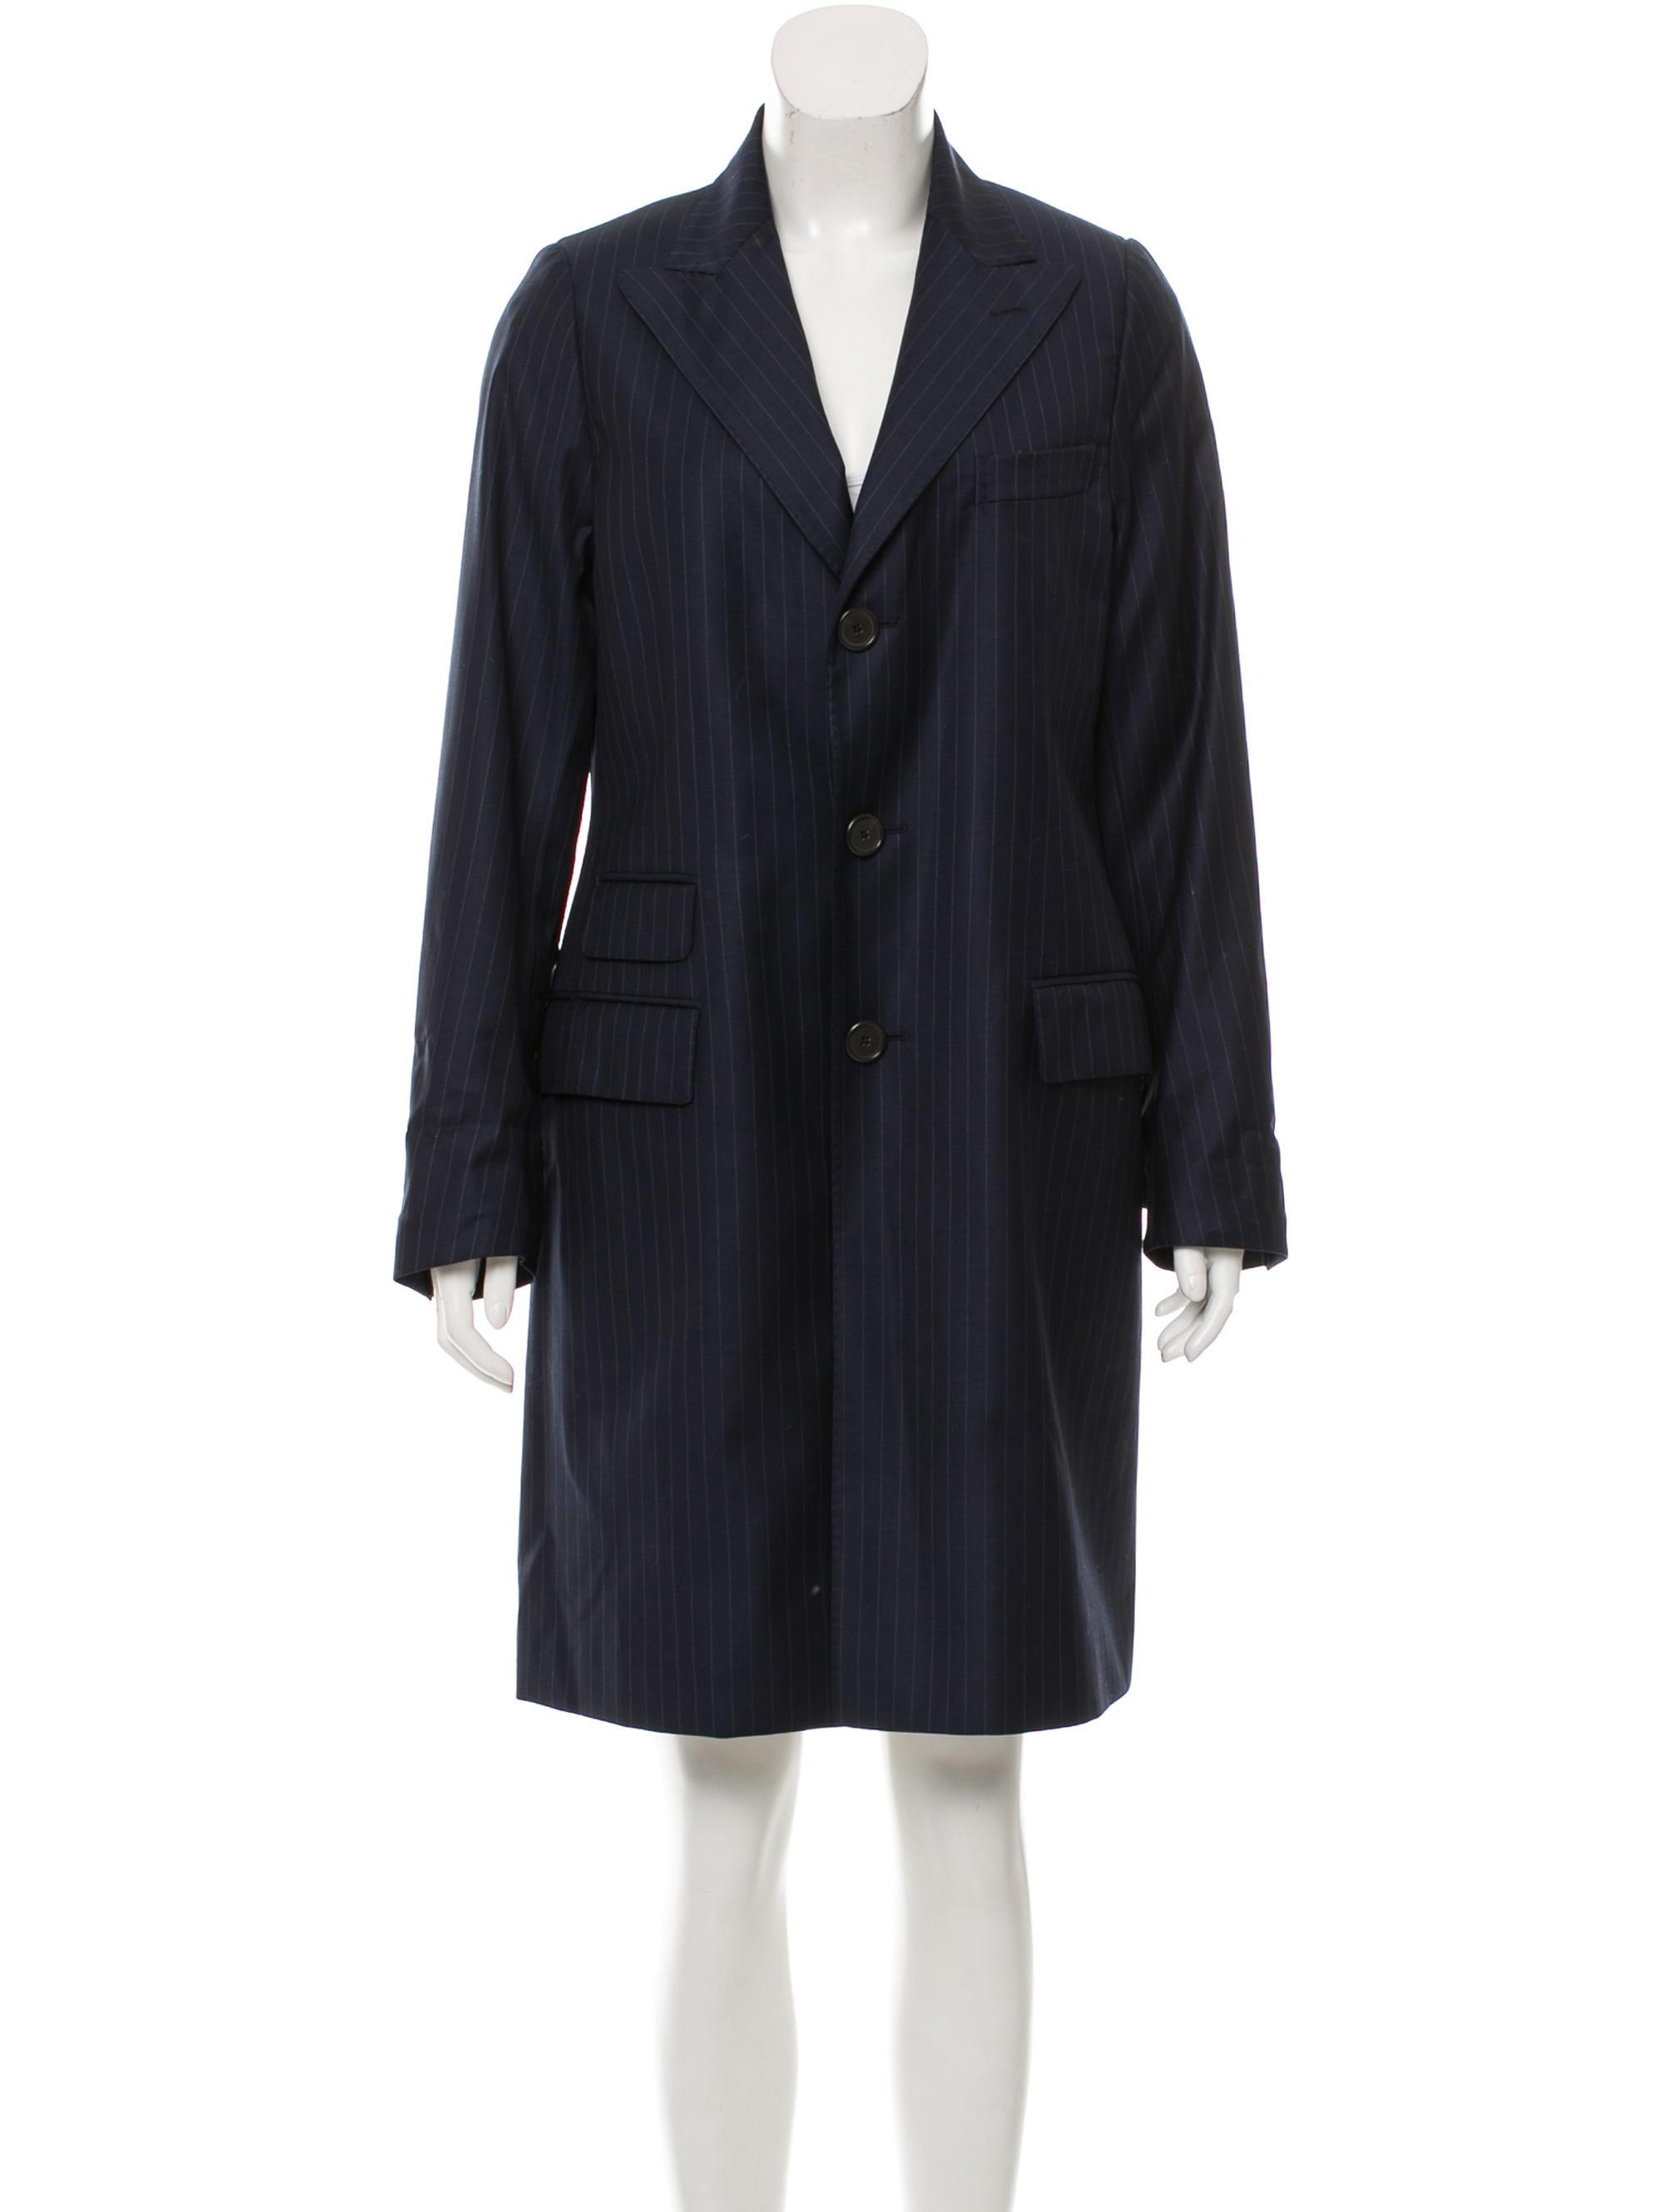 Fau00e7onnable Pinstriped Longline Jacket - Clothing - FAC20039   The RealReal